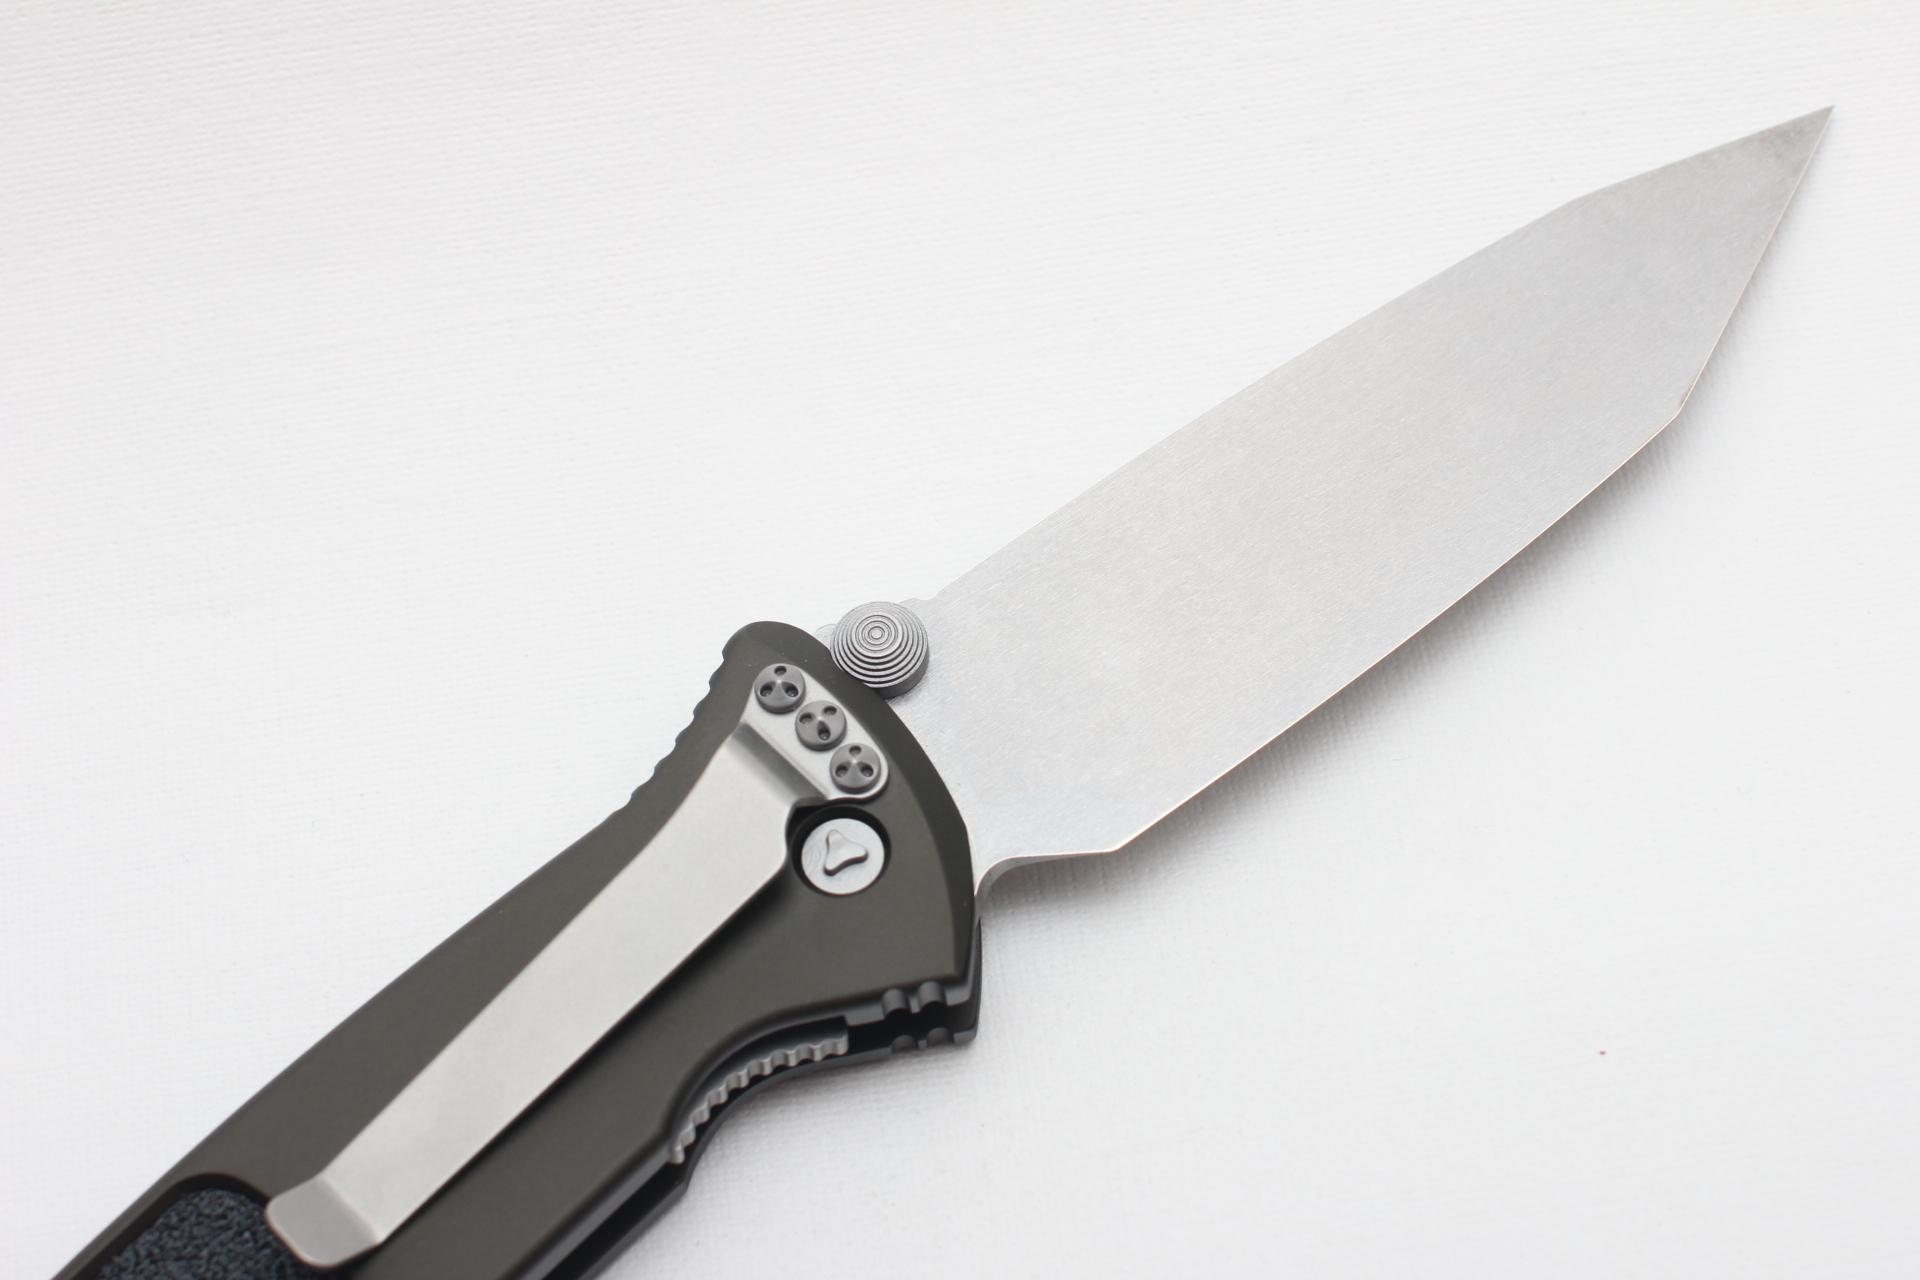 Нож Microtech MCT16210GR Socom Elite Satin - фотография